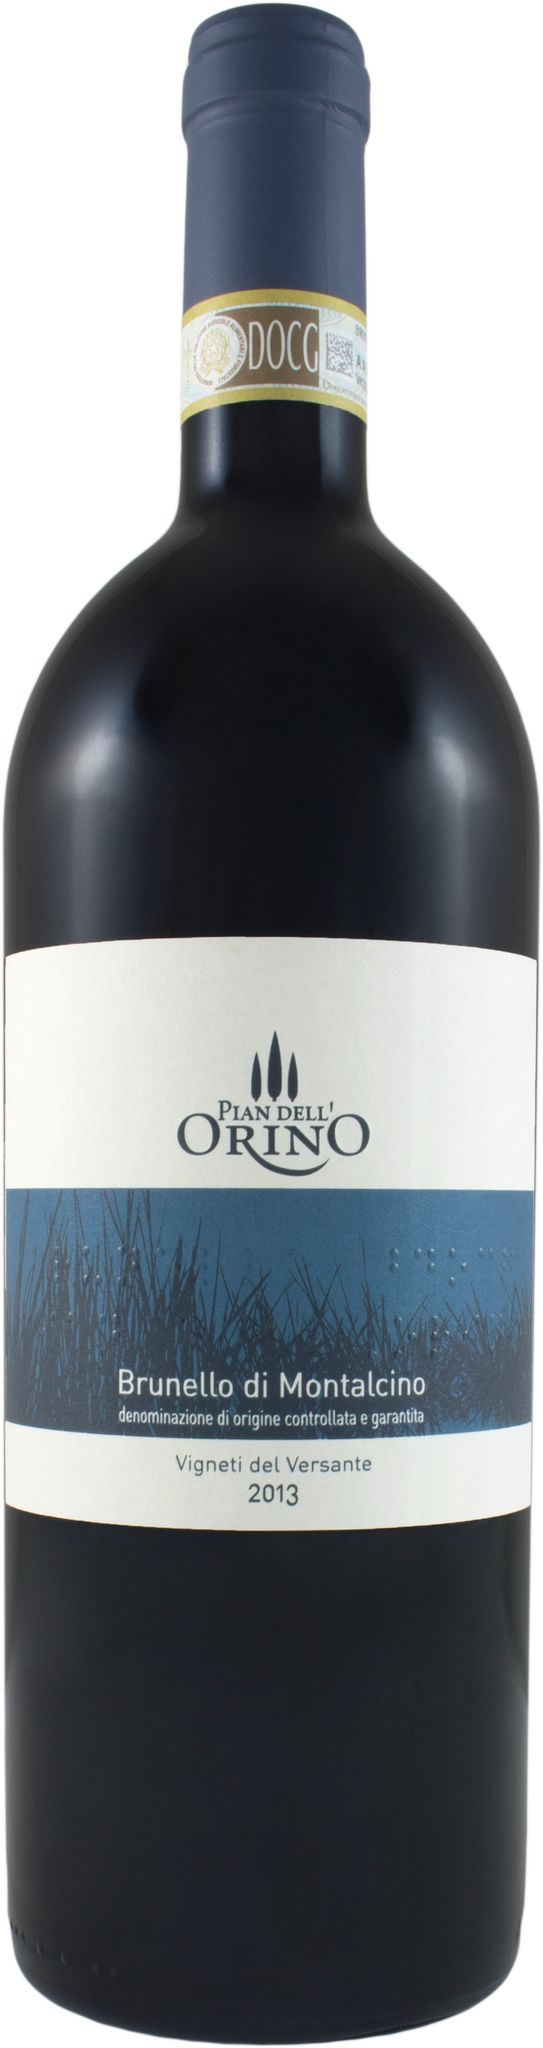 Produktbild på Brunello di Montalcino Vigneti del Versante